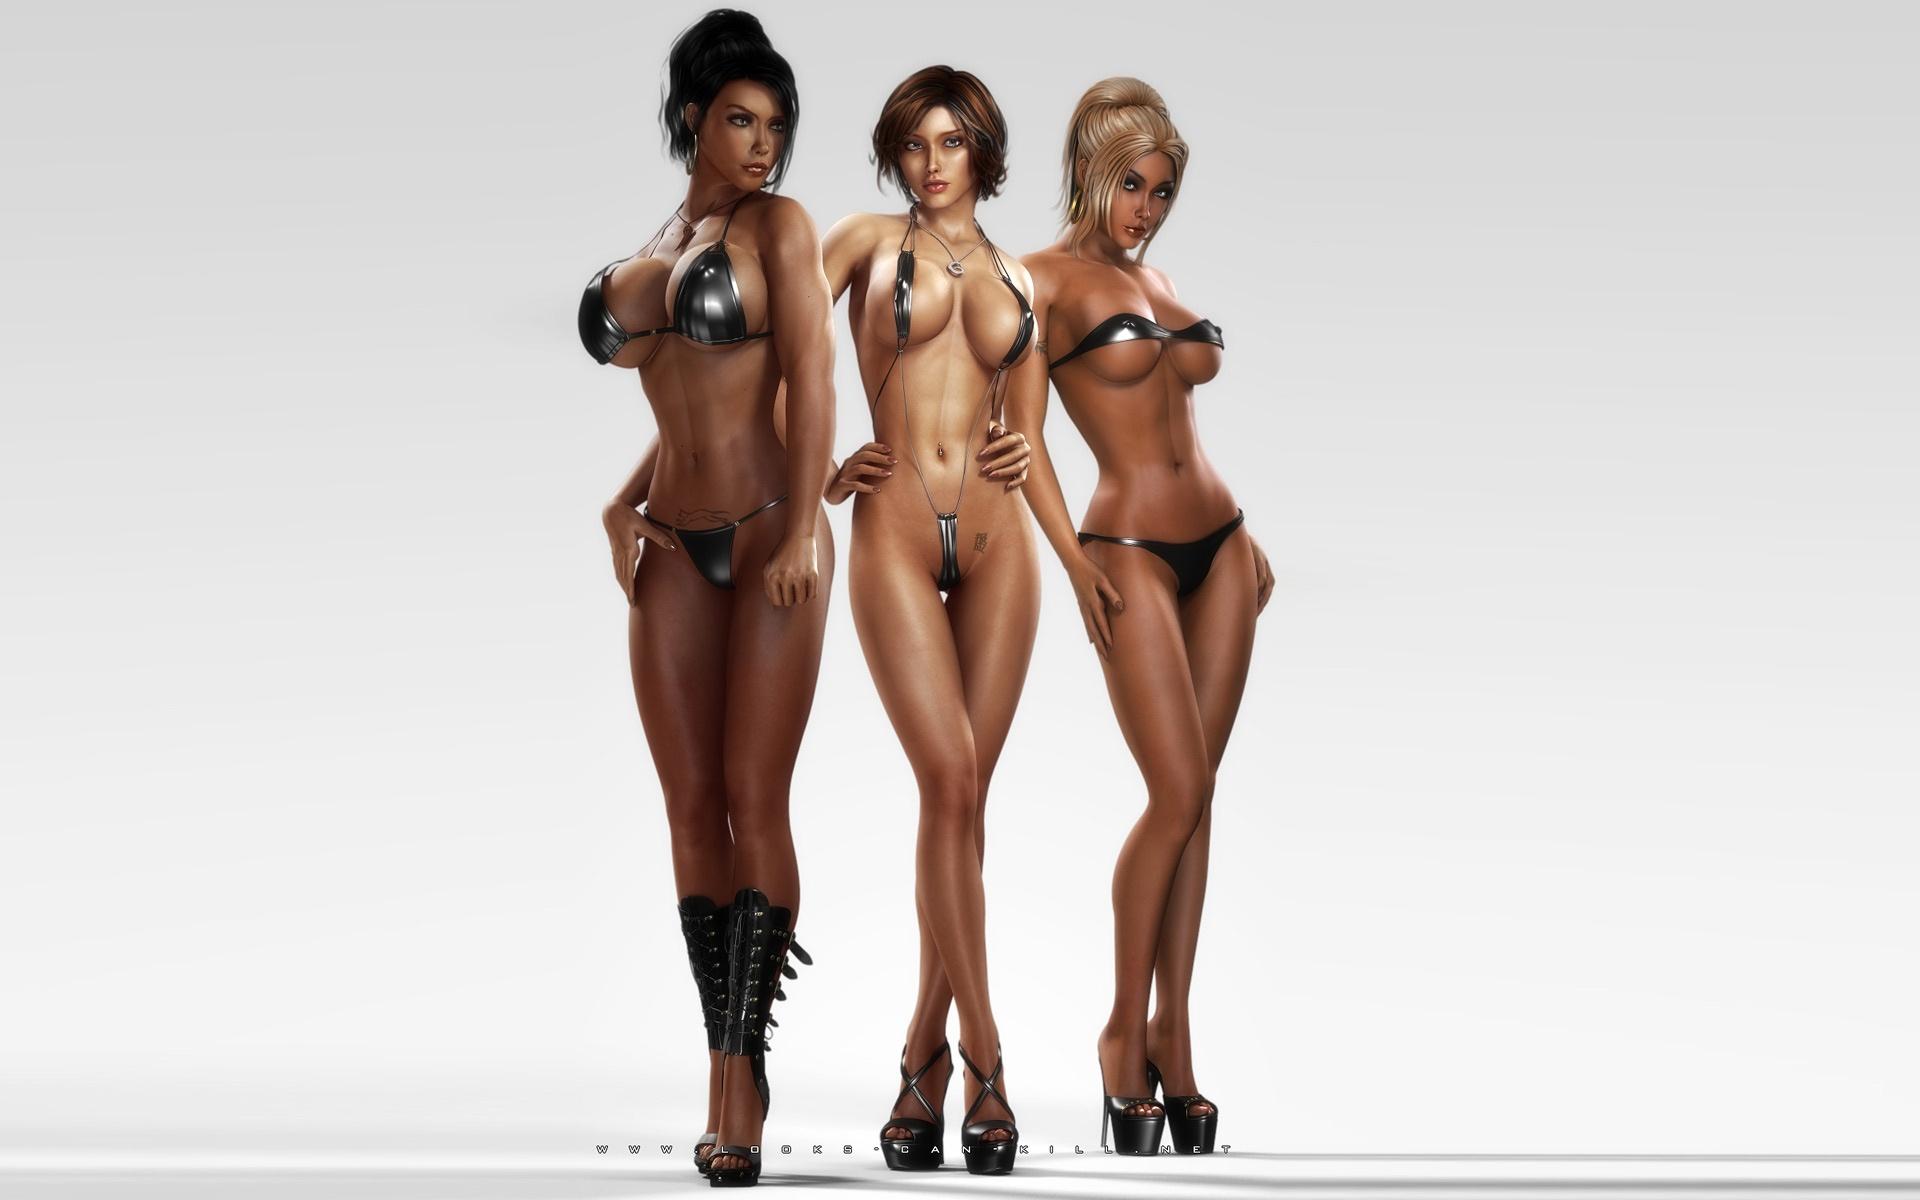 Hot big tits 3d models perfectly crafted women models cgi ...